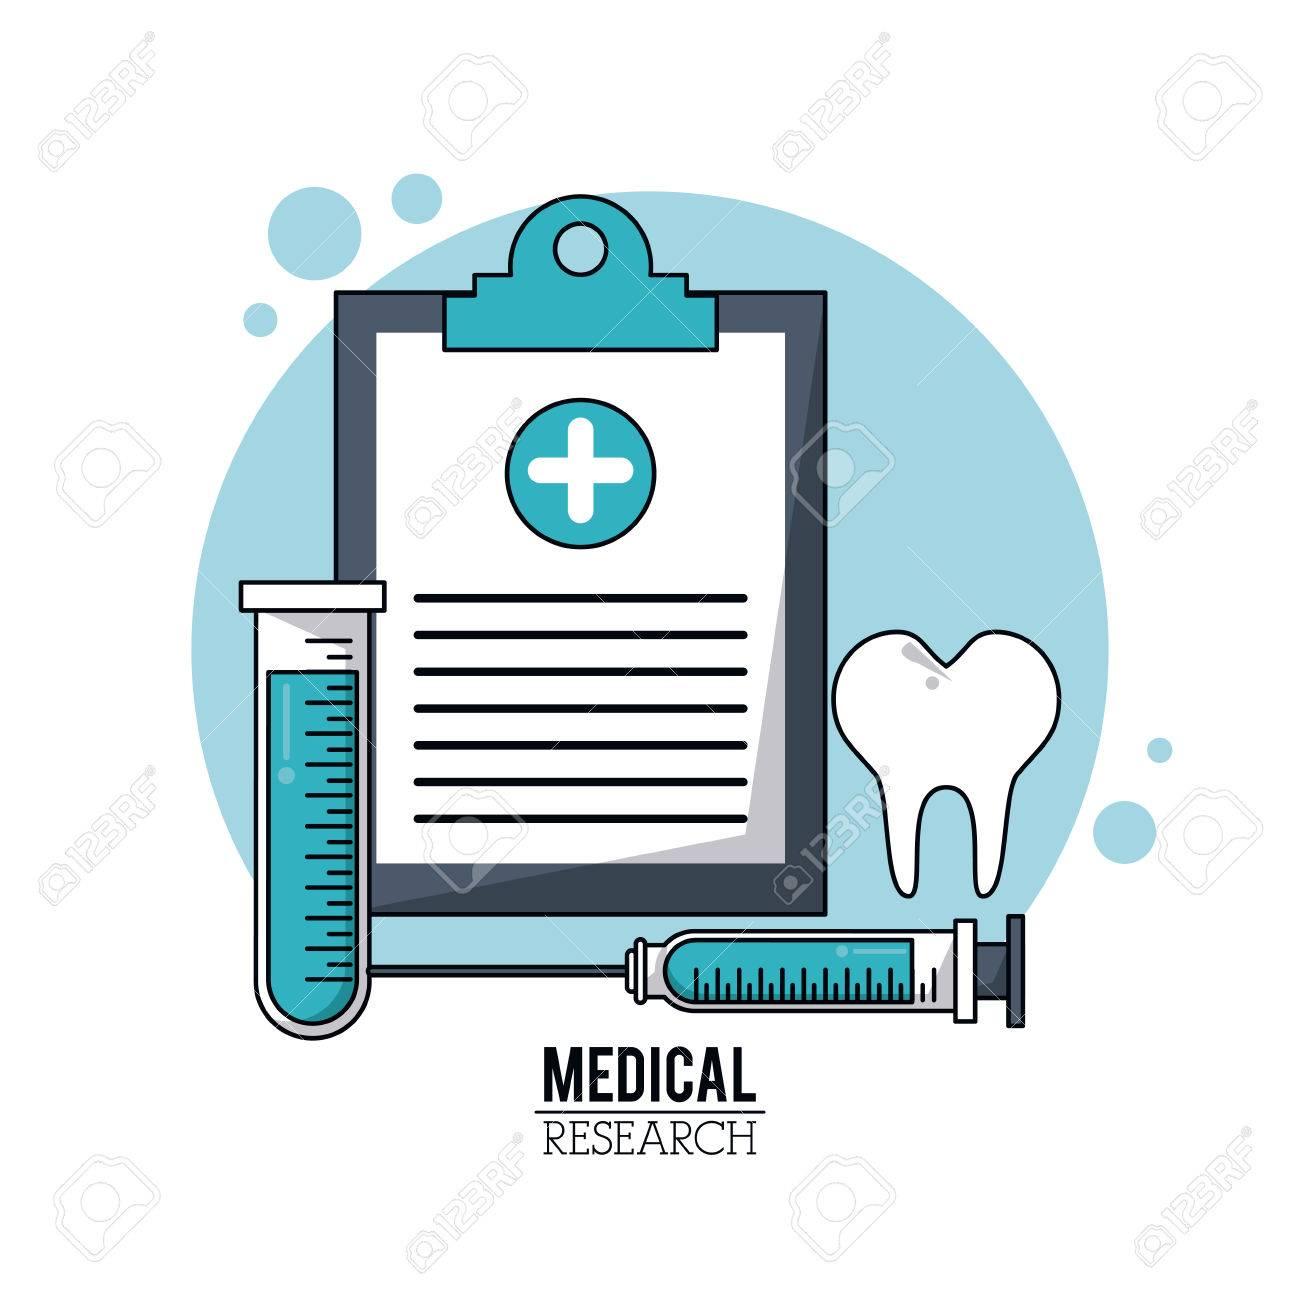 Farbe Poster Medizinische Forschung Mit Symbolen Medizinische ...